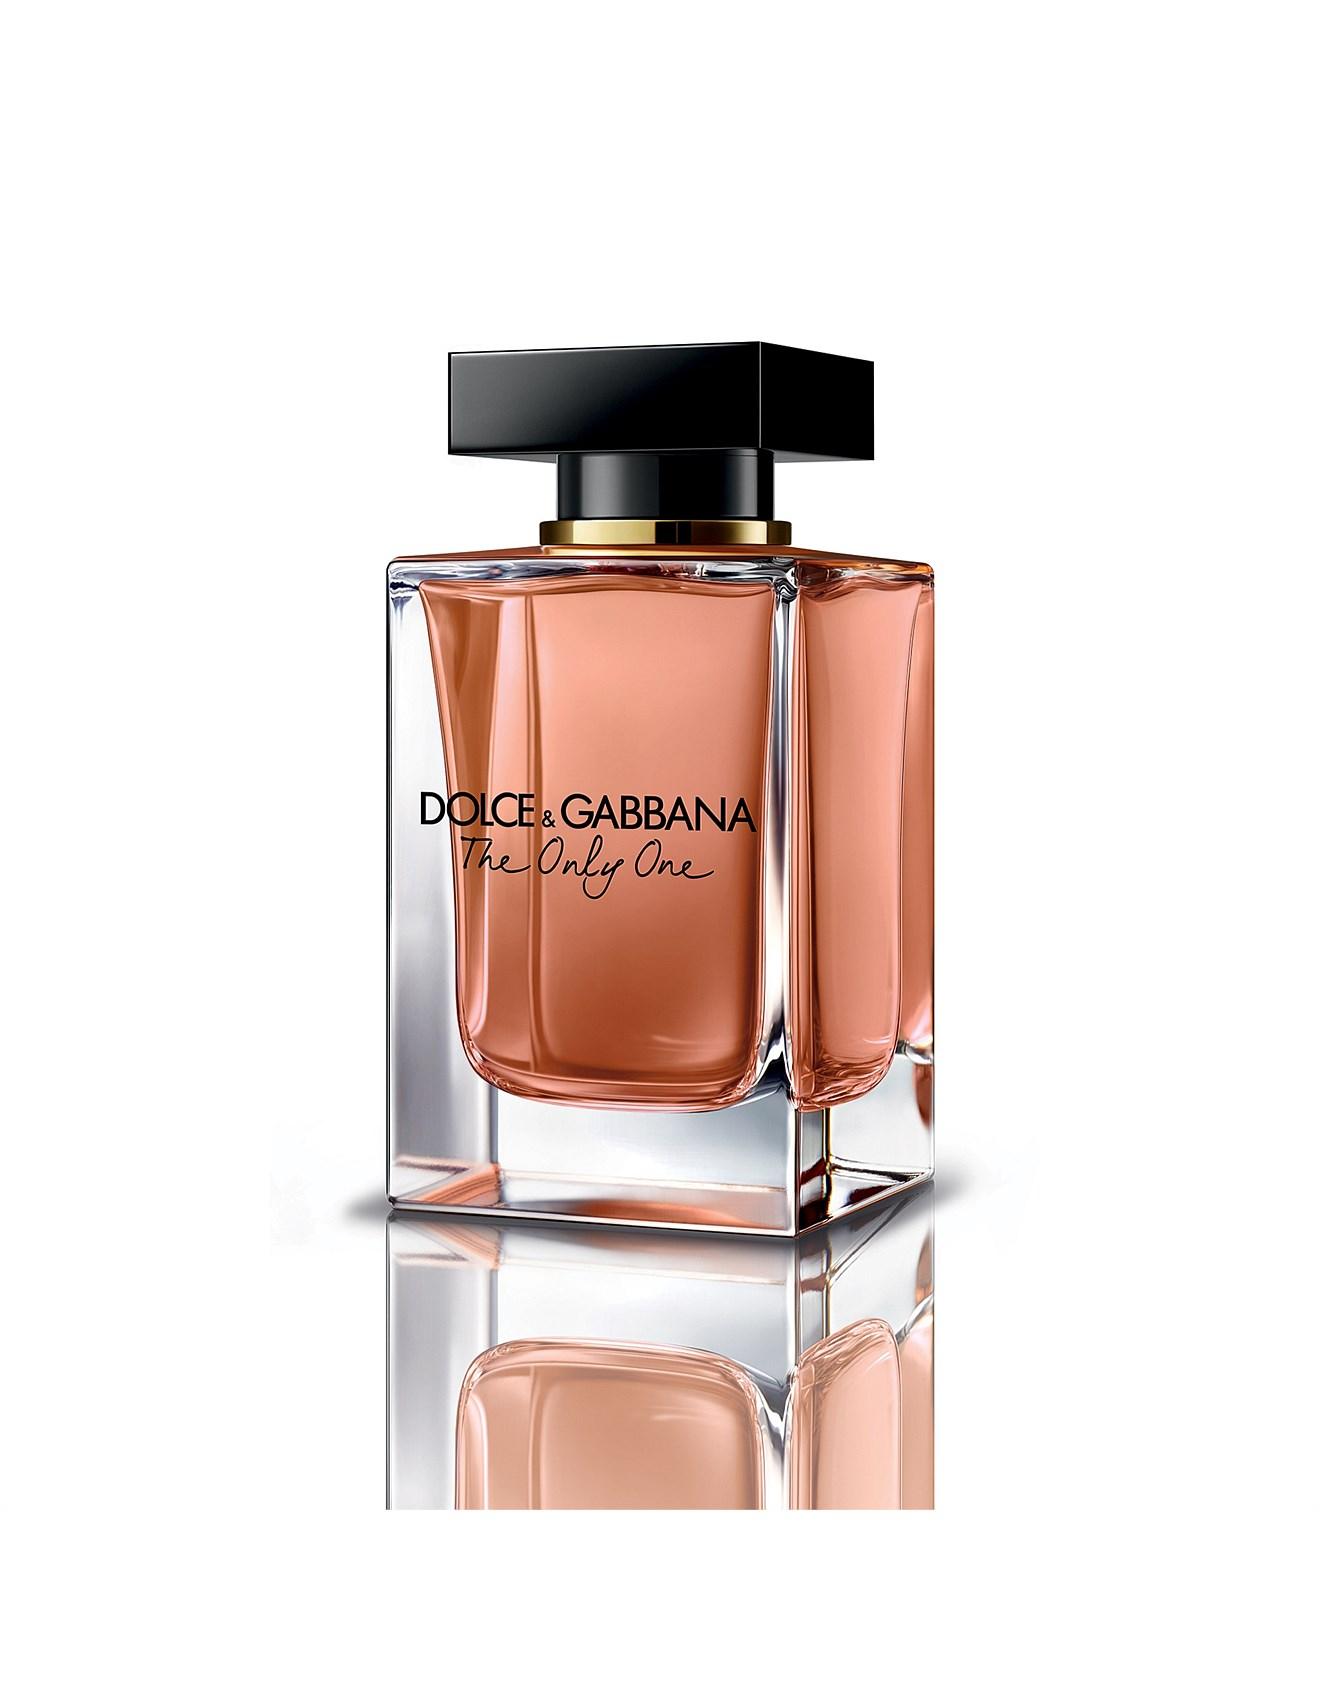 31dbcc91e1 Dolce & Gabbana | Buy Dolce & Gabbana Online | David Jones - The ...